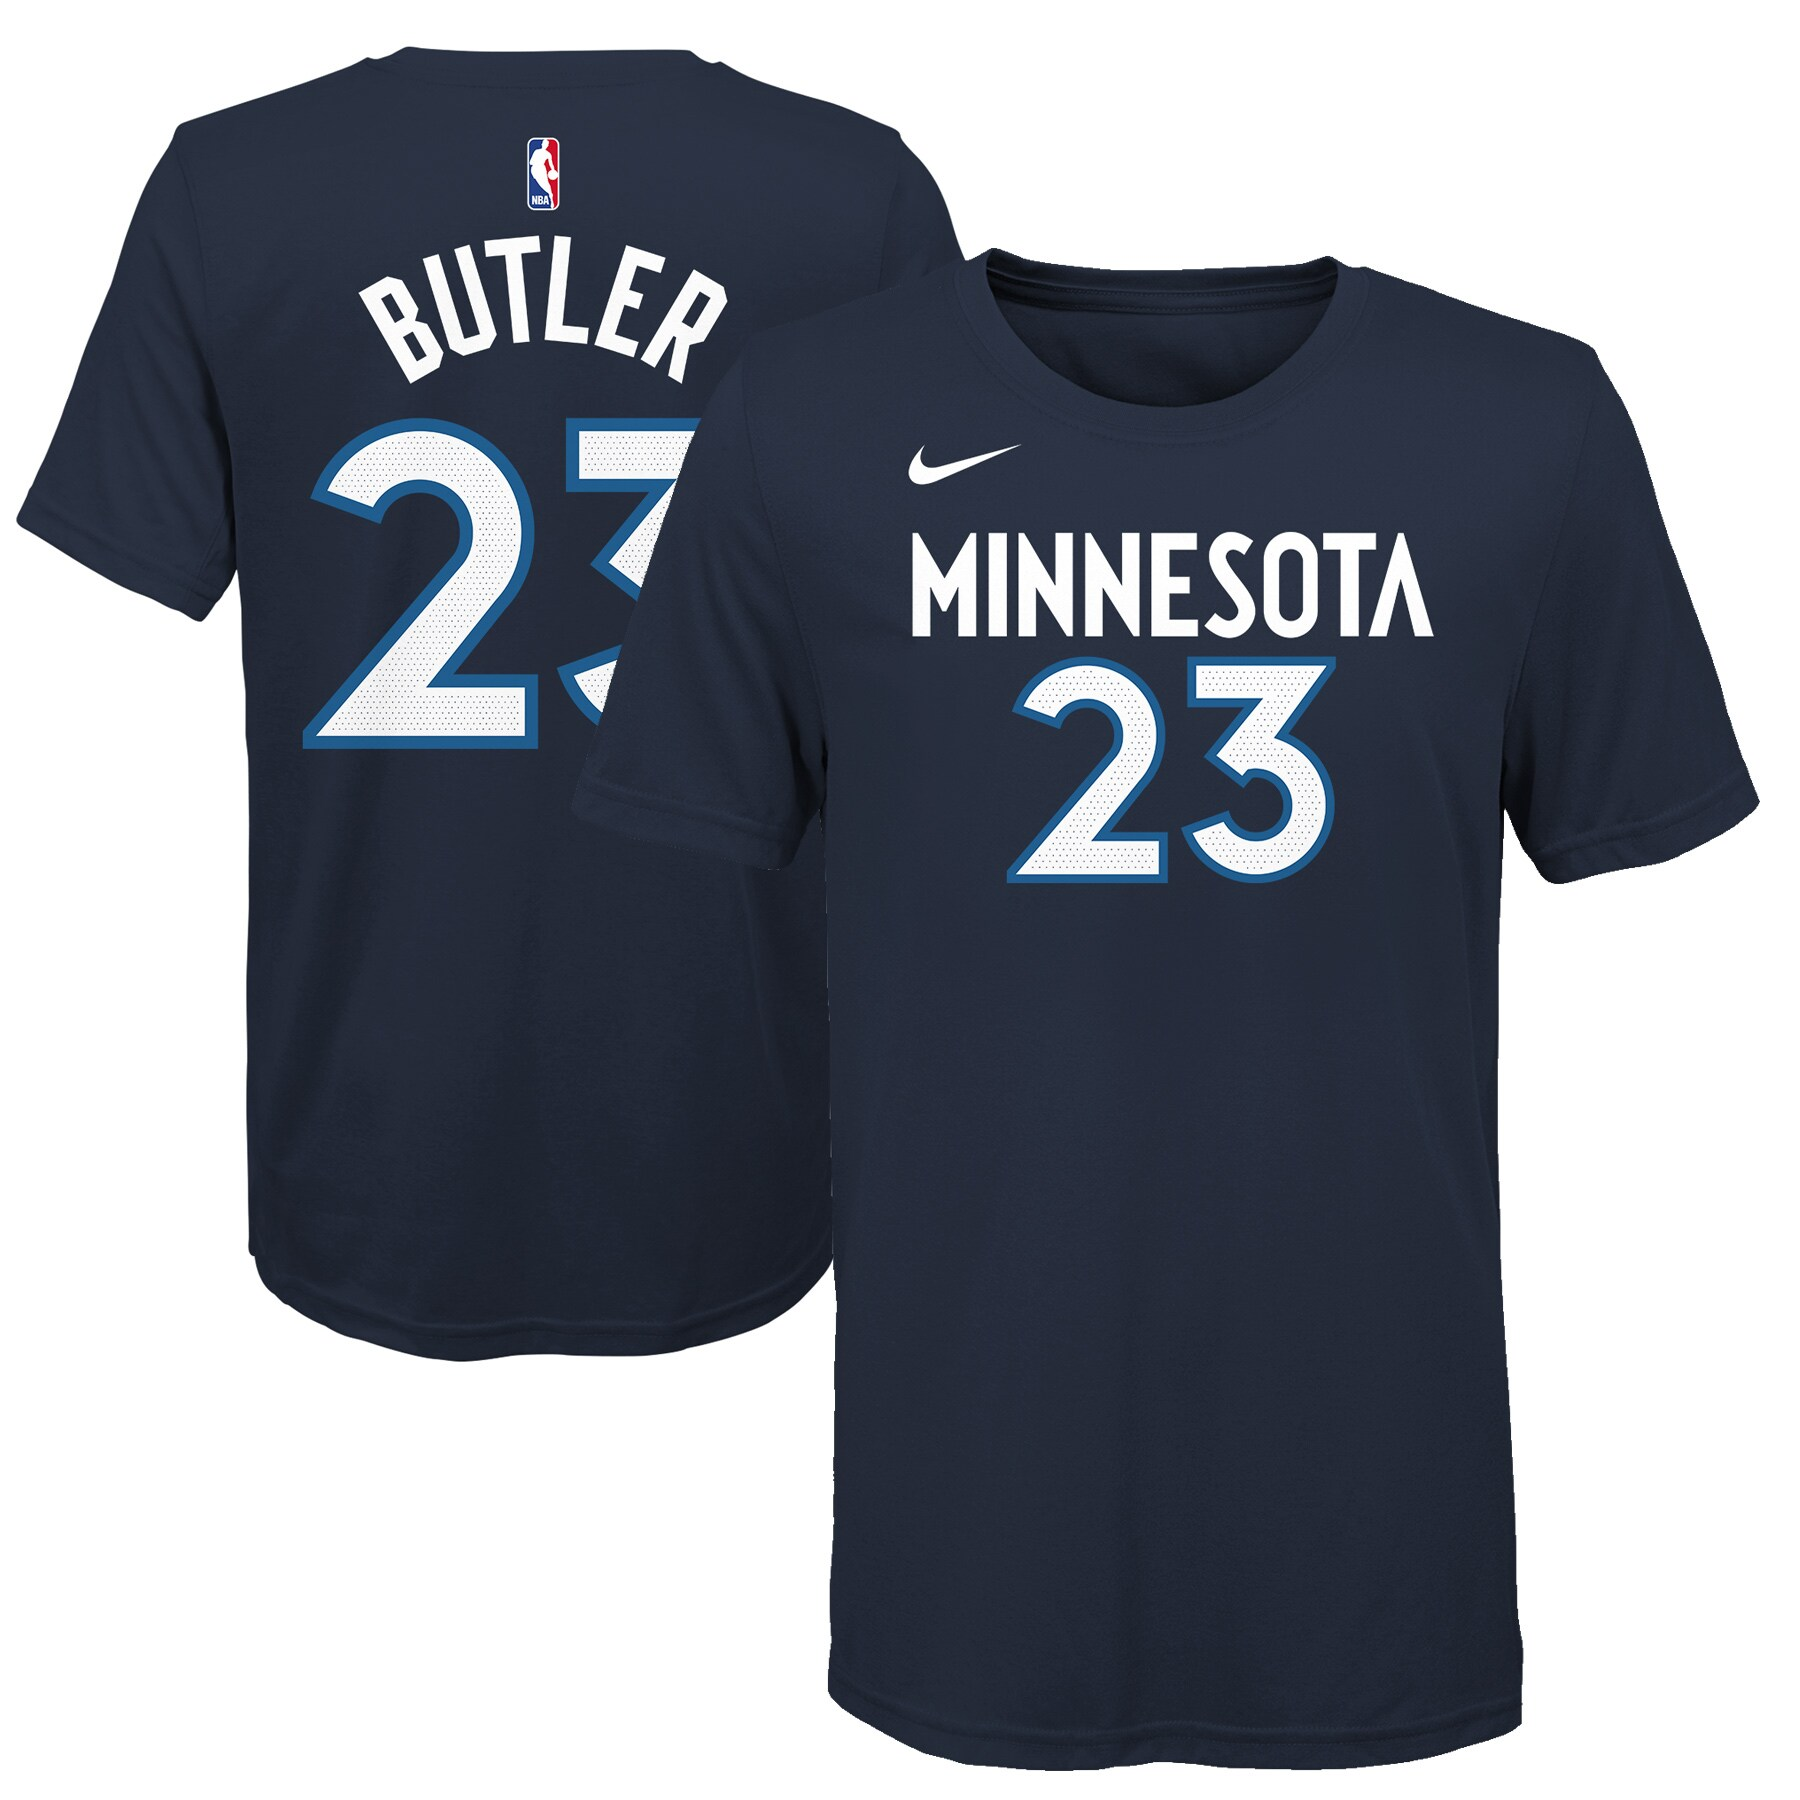 Jimmy Butler Minnesota Timberwolves Nike Youth Name & Number T-Shirt - Navy